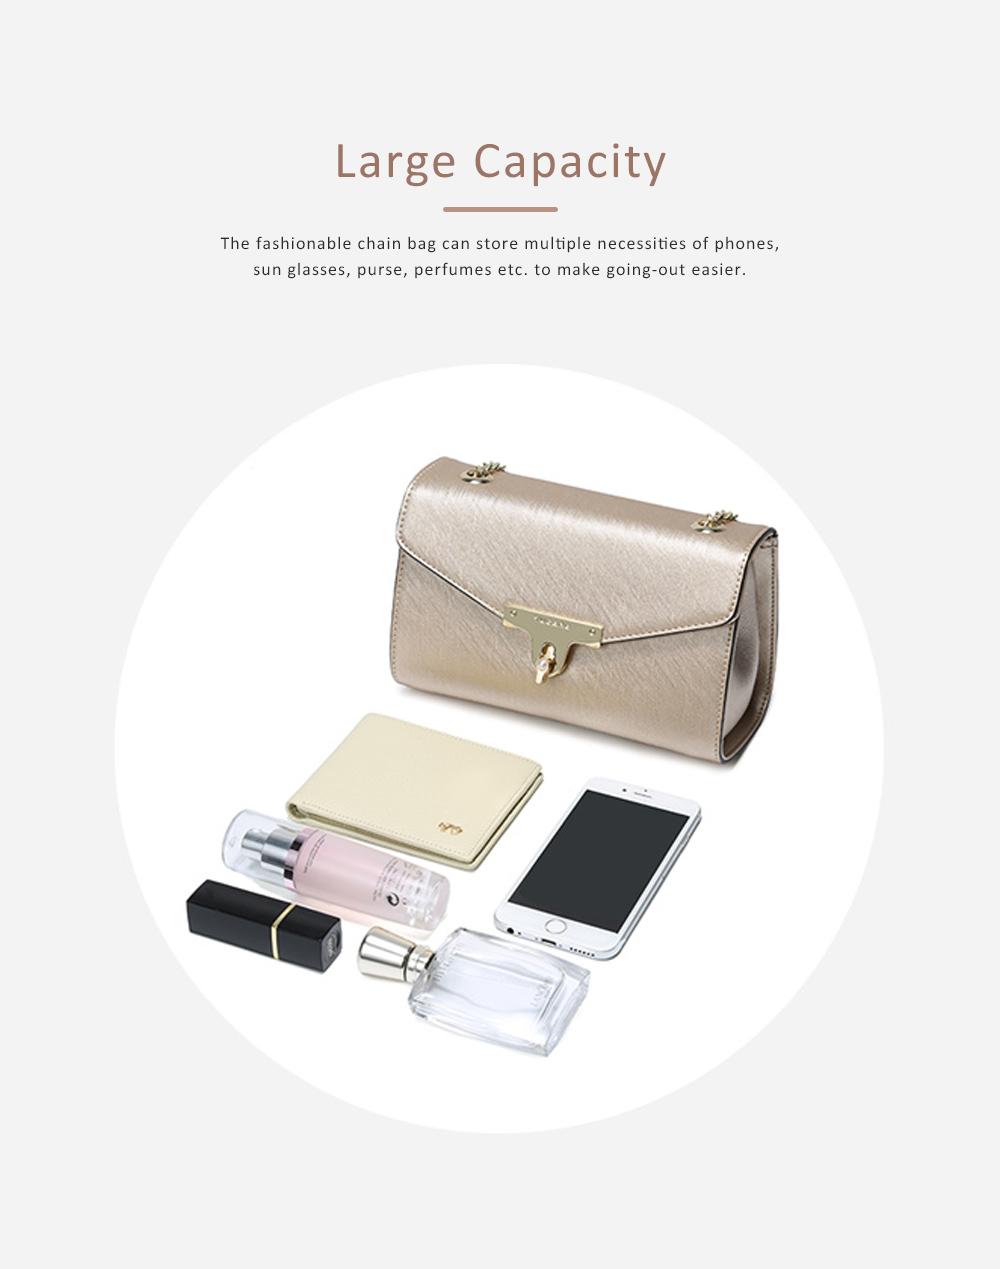 TUCANO Chain Bag for Women, Fashionable Square Messenger Bag for Women Spring Summer, Single-shoulder Bag 2